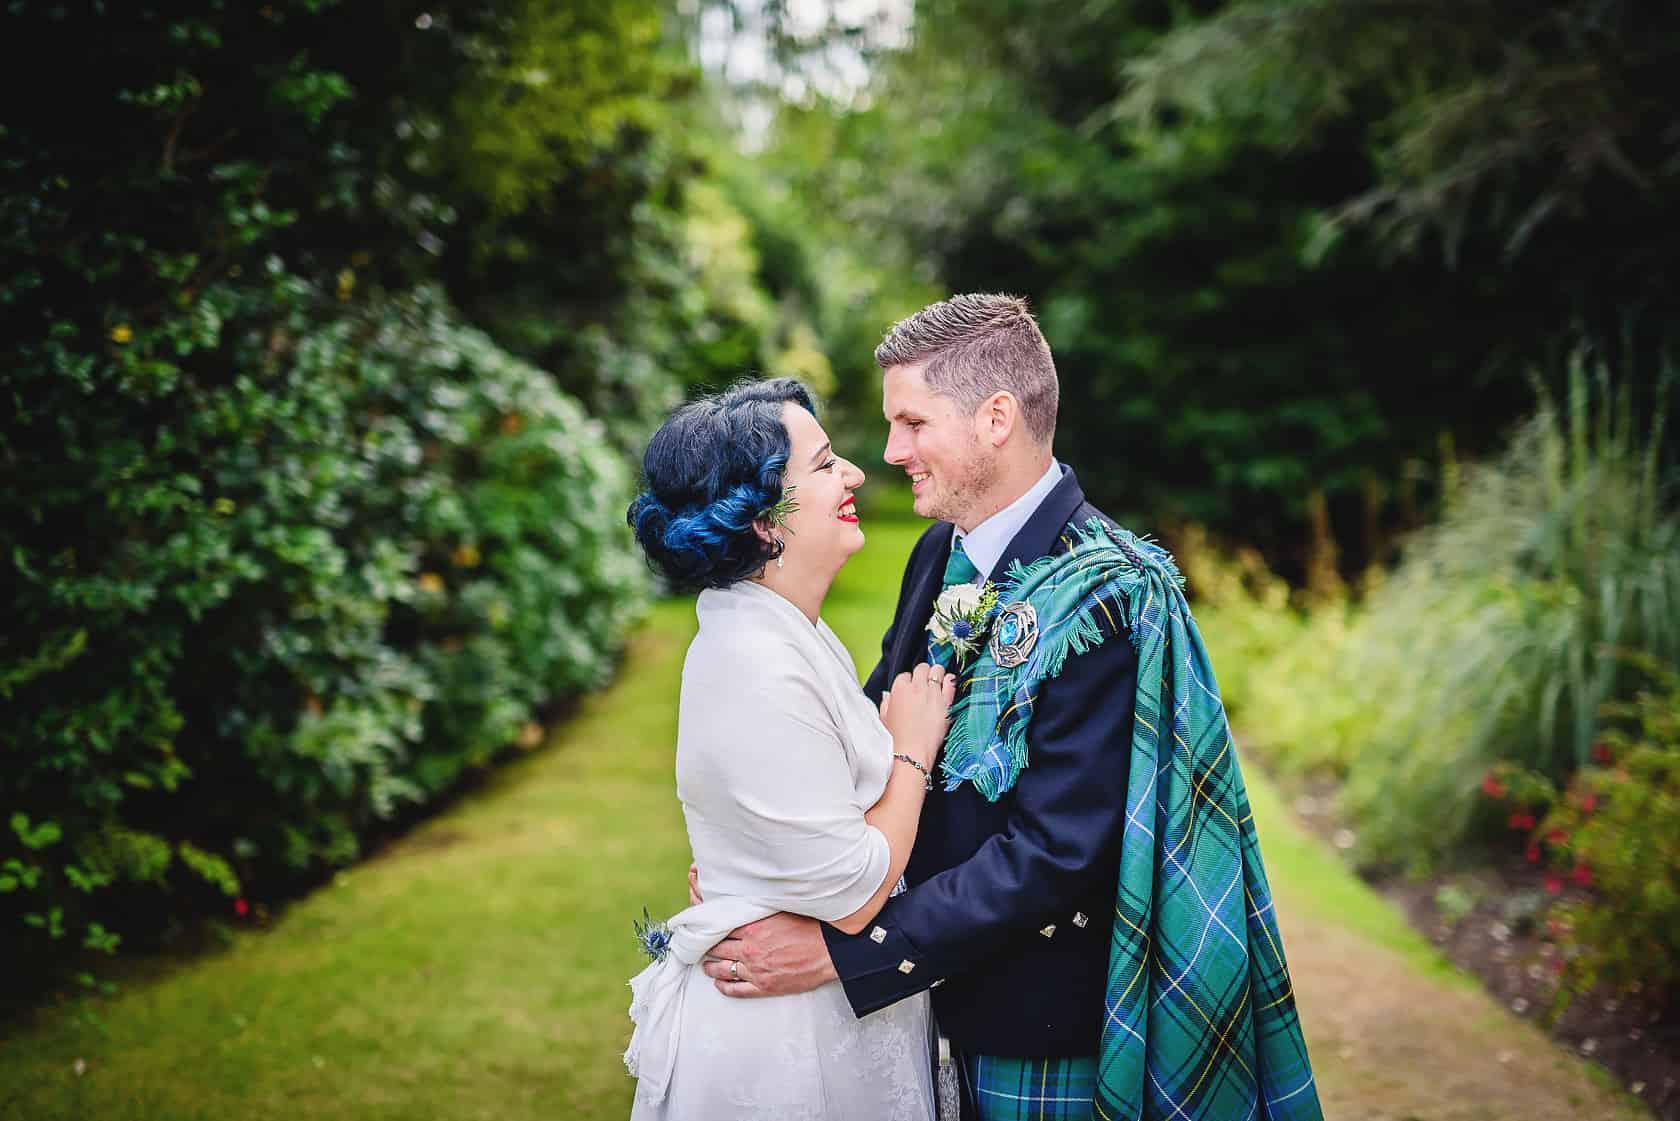 Best_Wedding_Photography_2018_Wedding-Photographer-Essex-and-London_045